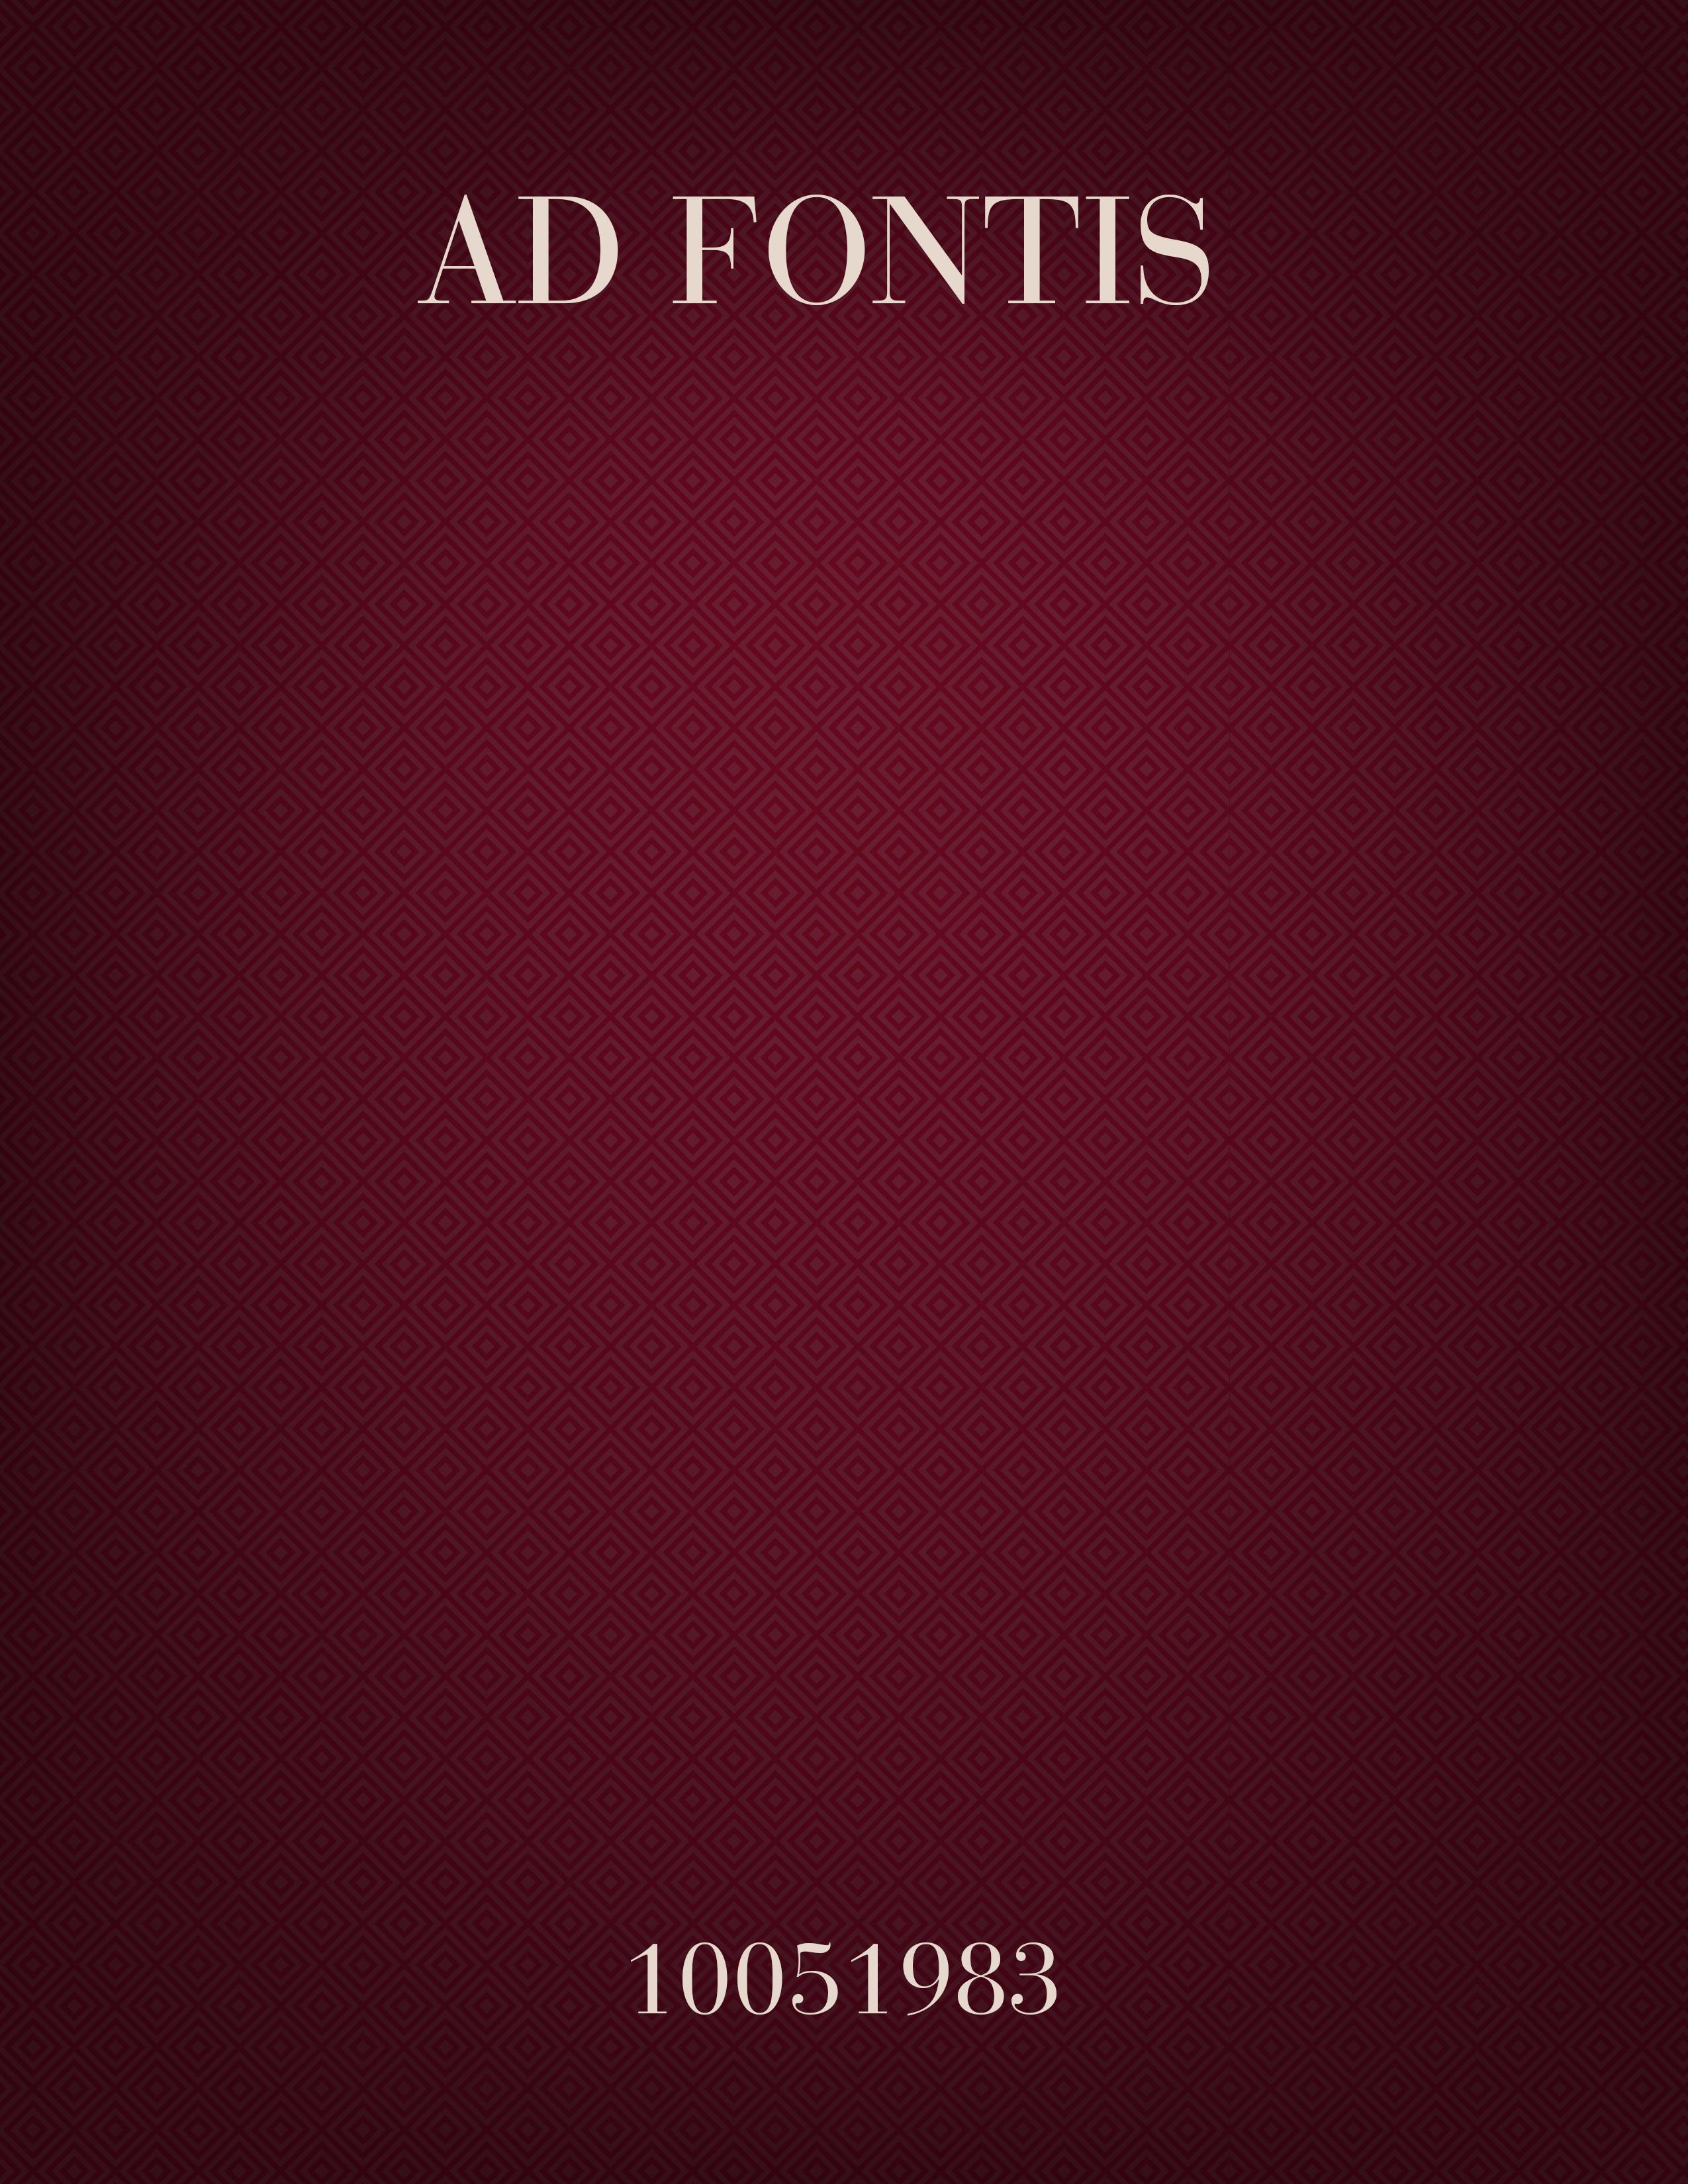 Ad Fontis